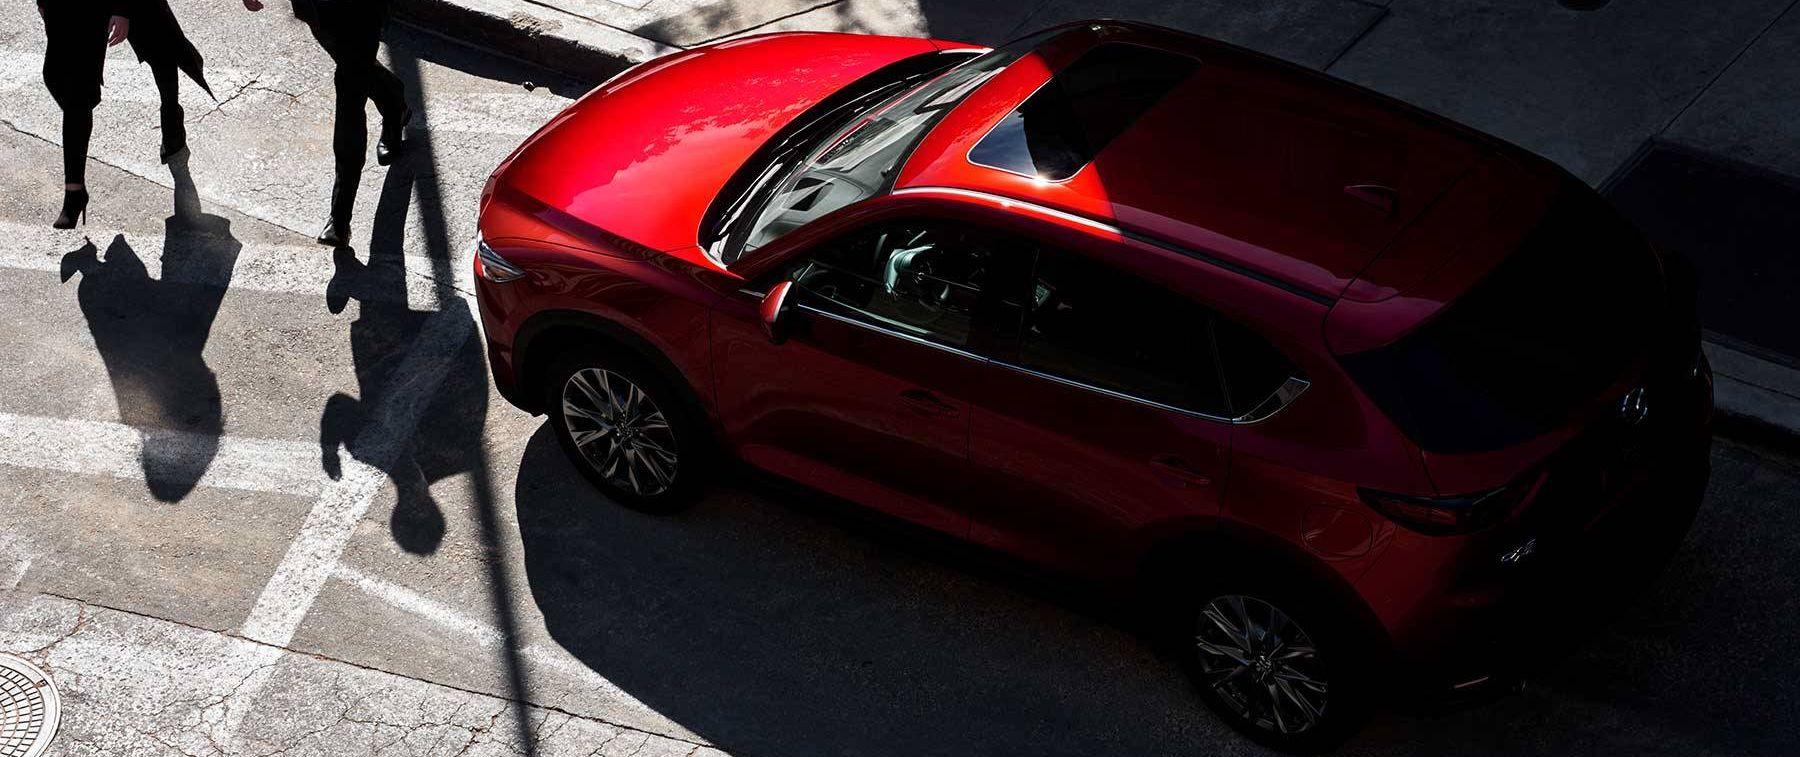 2019 Mazda CX-5 Leasing near Bastrop, LA